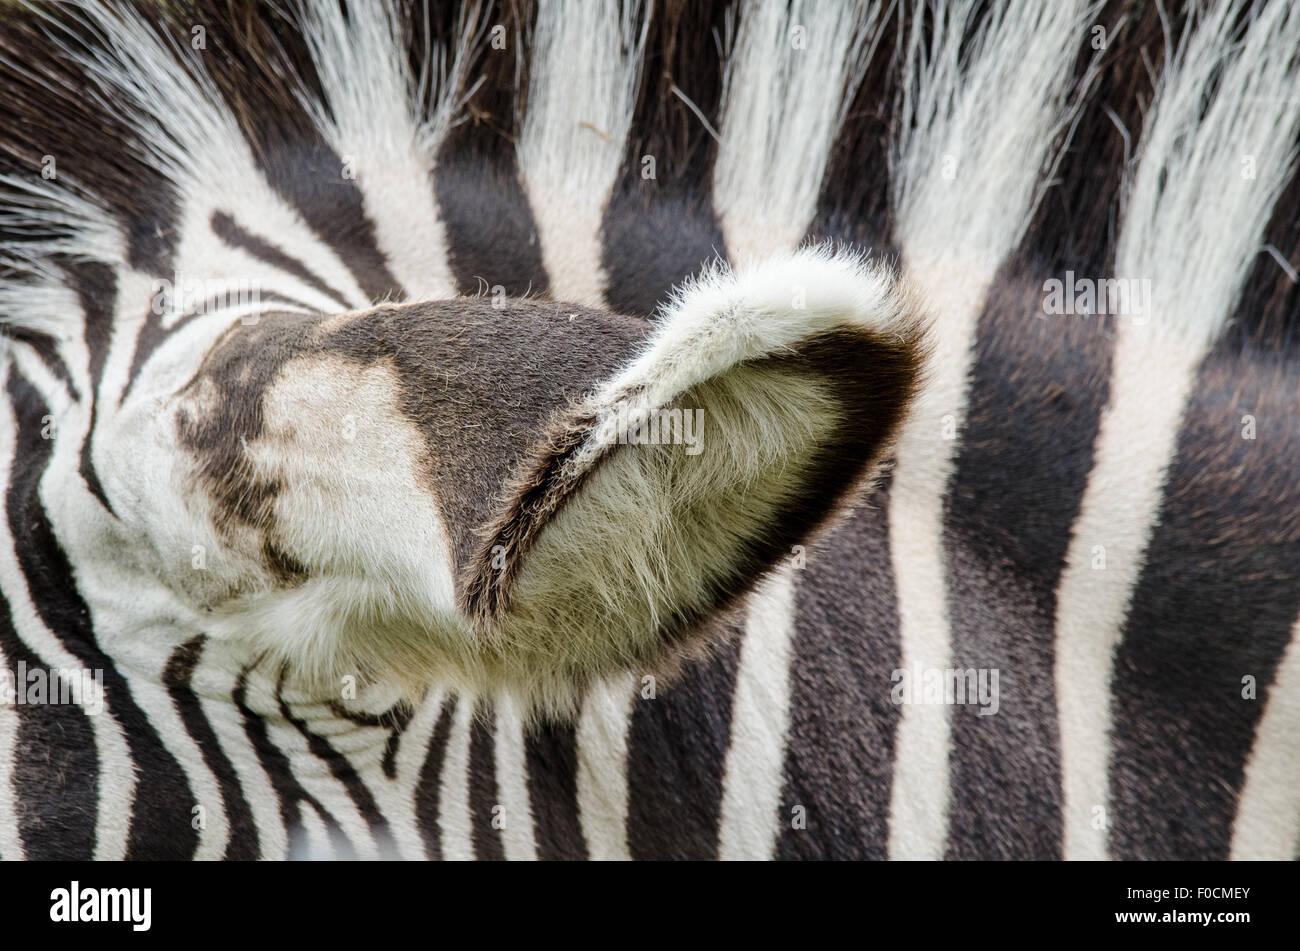 Zebra Ear and Stripes - Stock Image